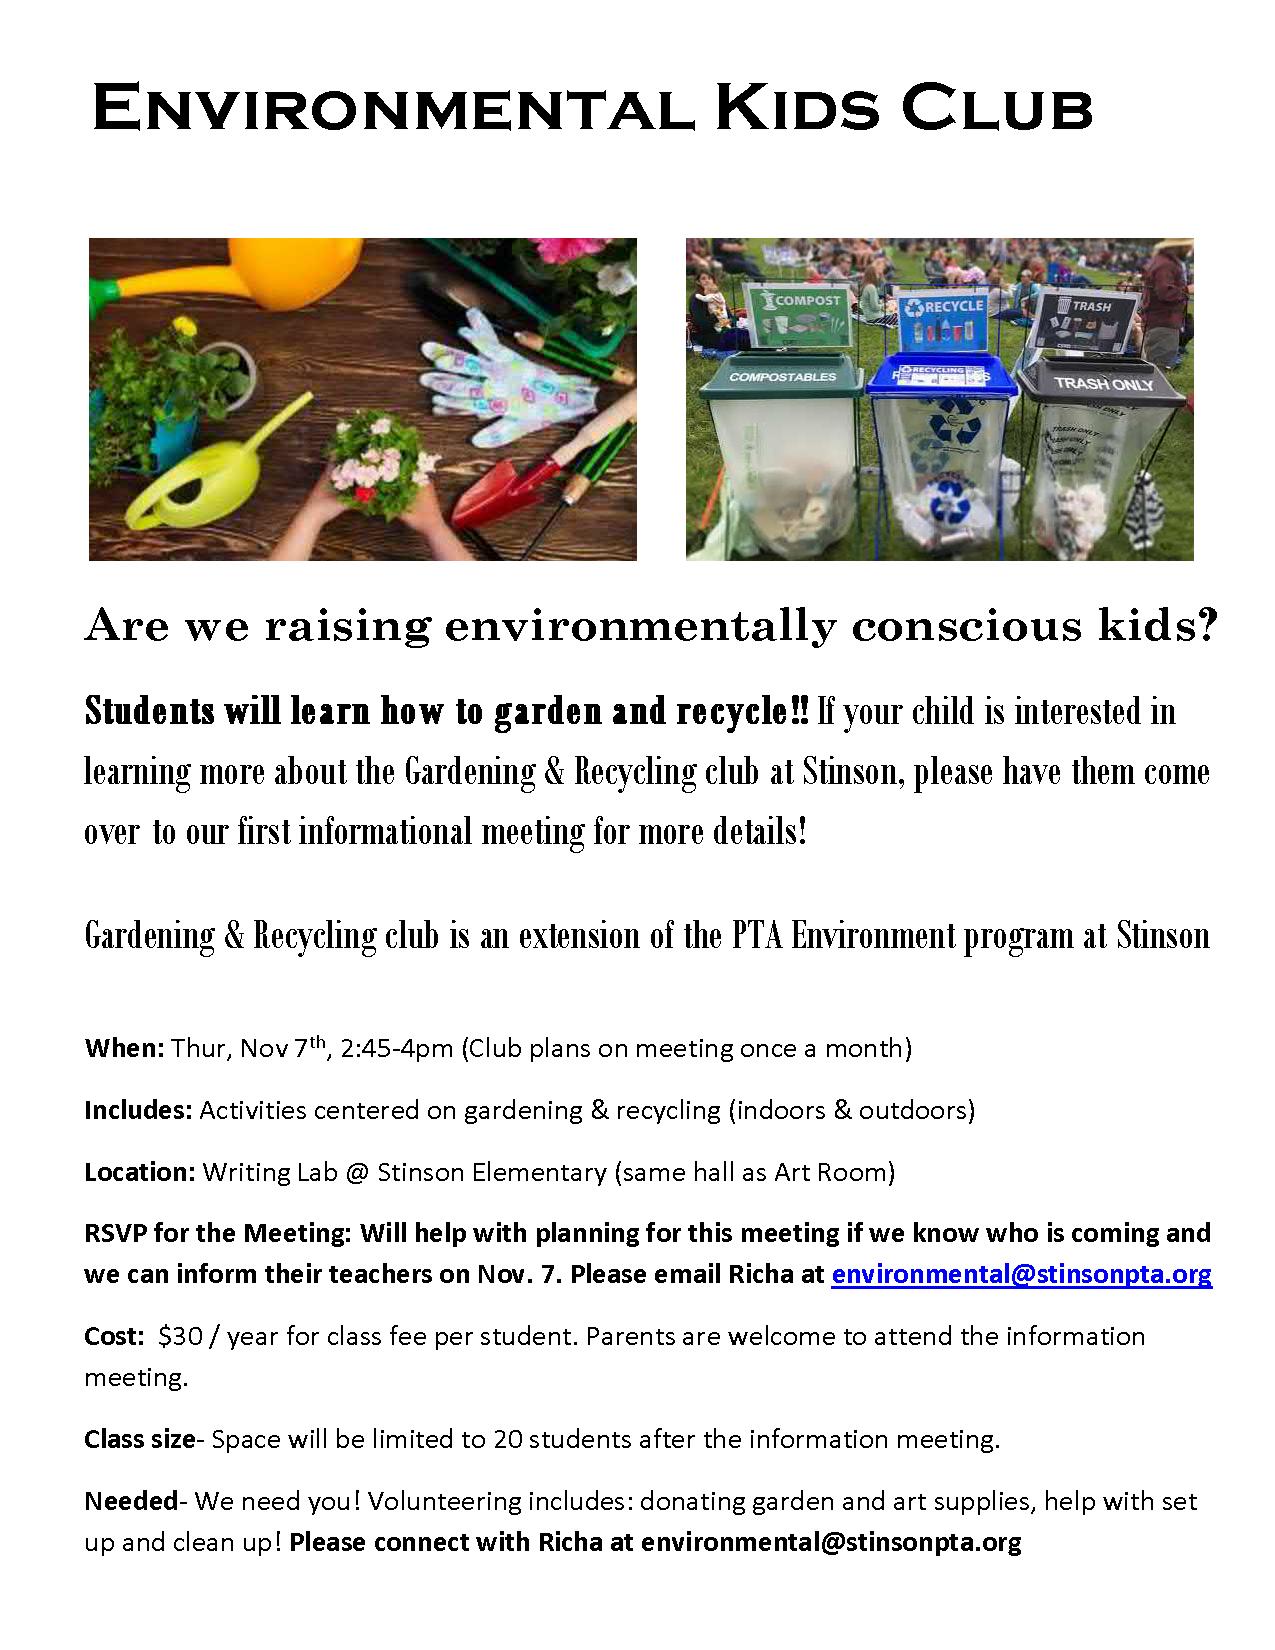 Environmental Club Flyer